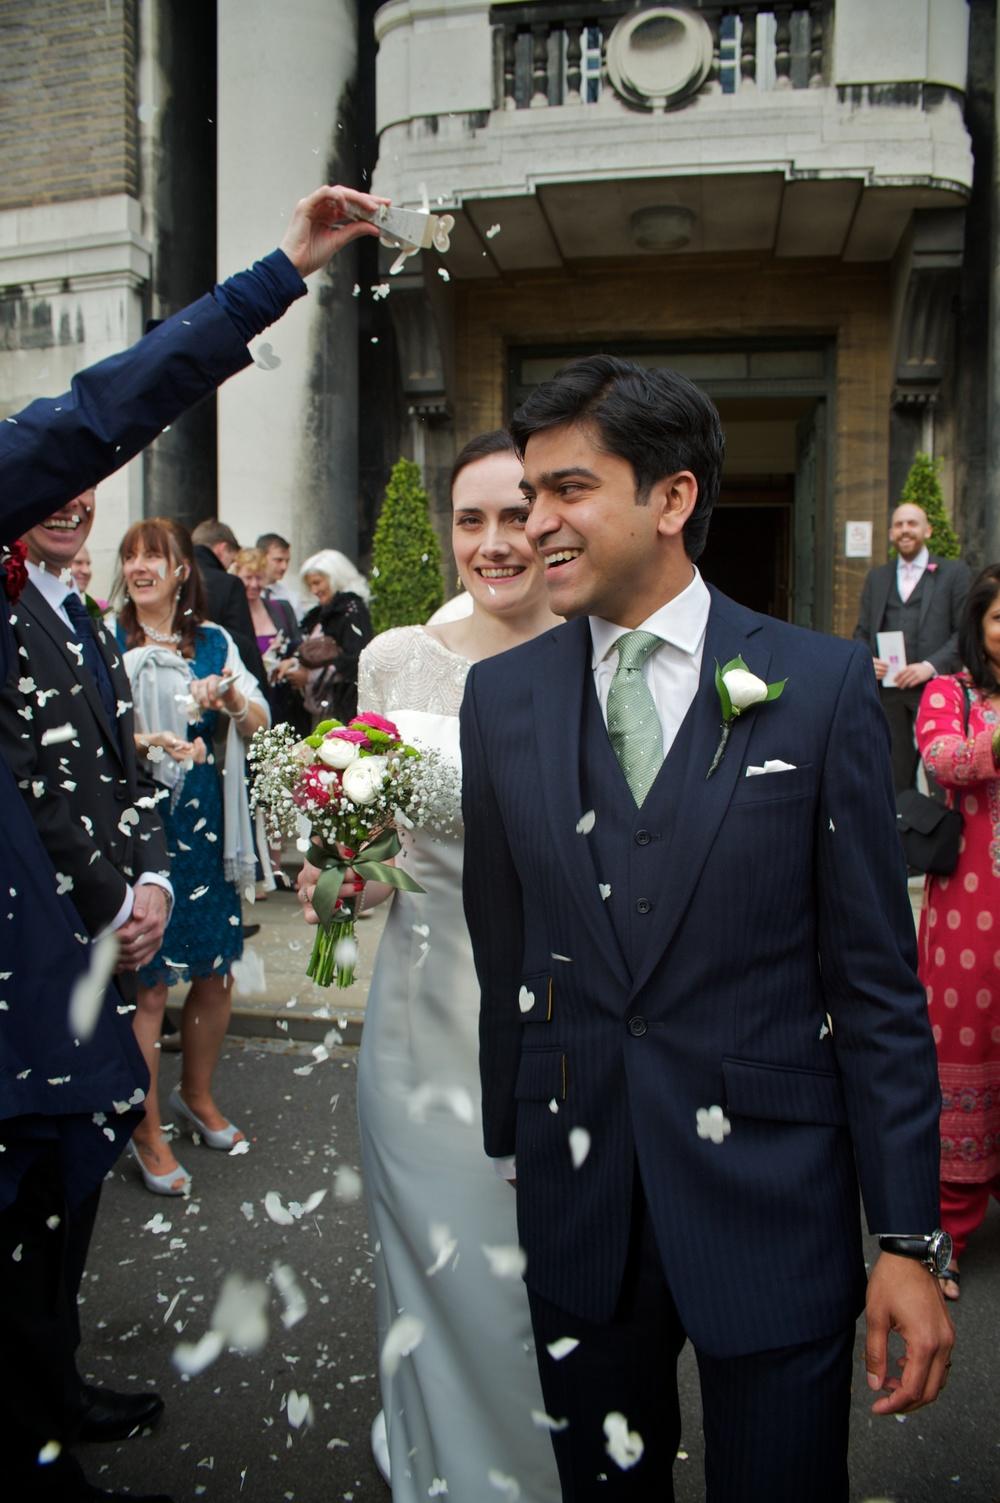 jade-raz-ahasan-wedding-navy-herringbone-wool-three-piece-suit-bespoke-all-uk-made.jpg